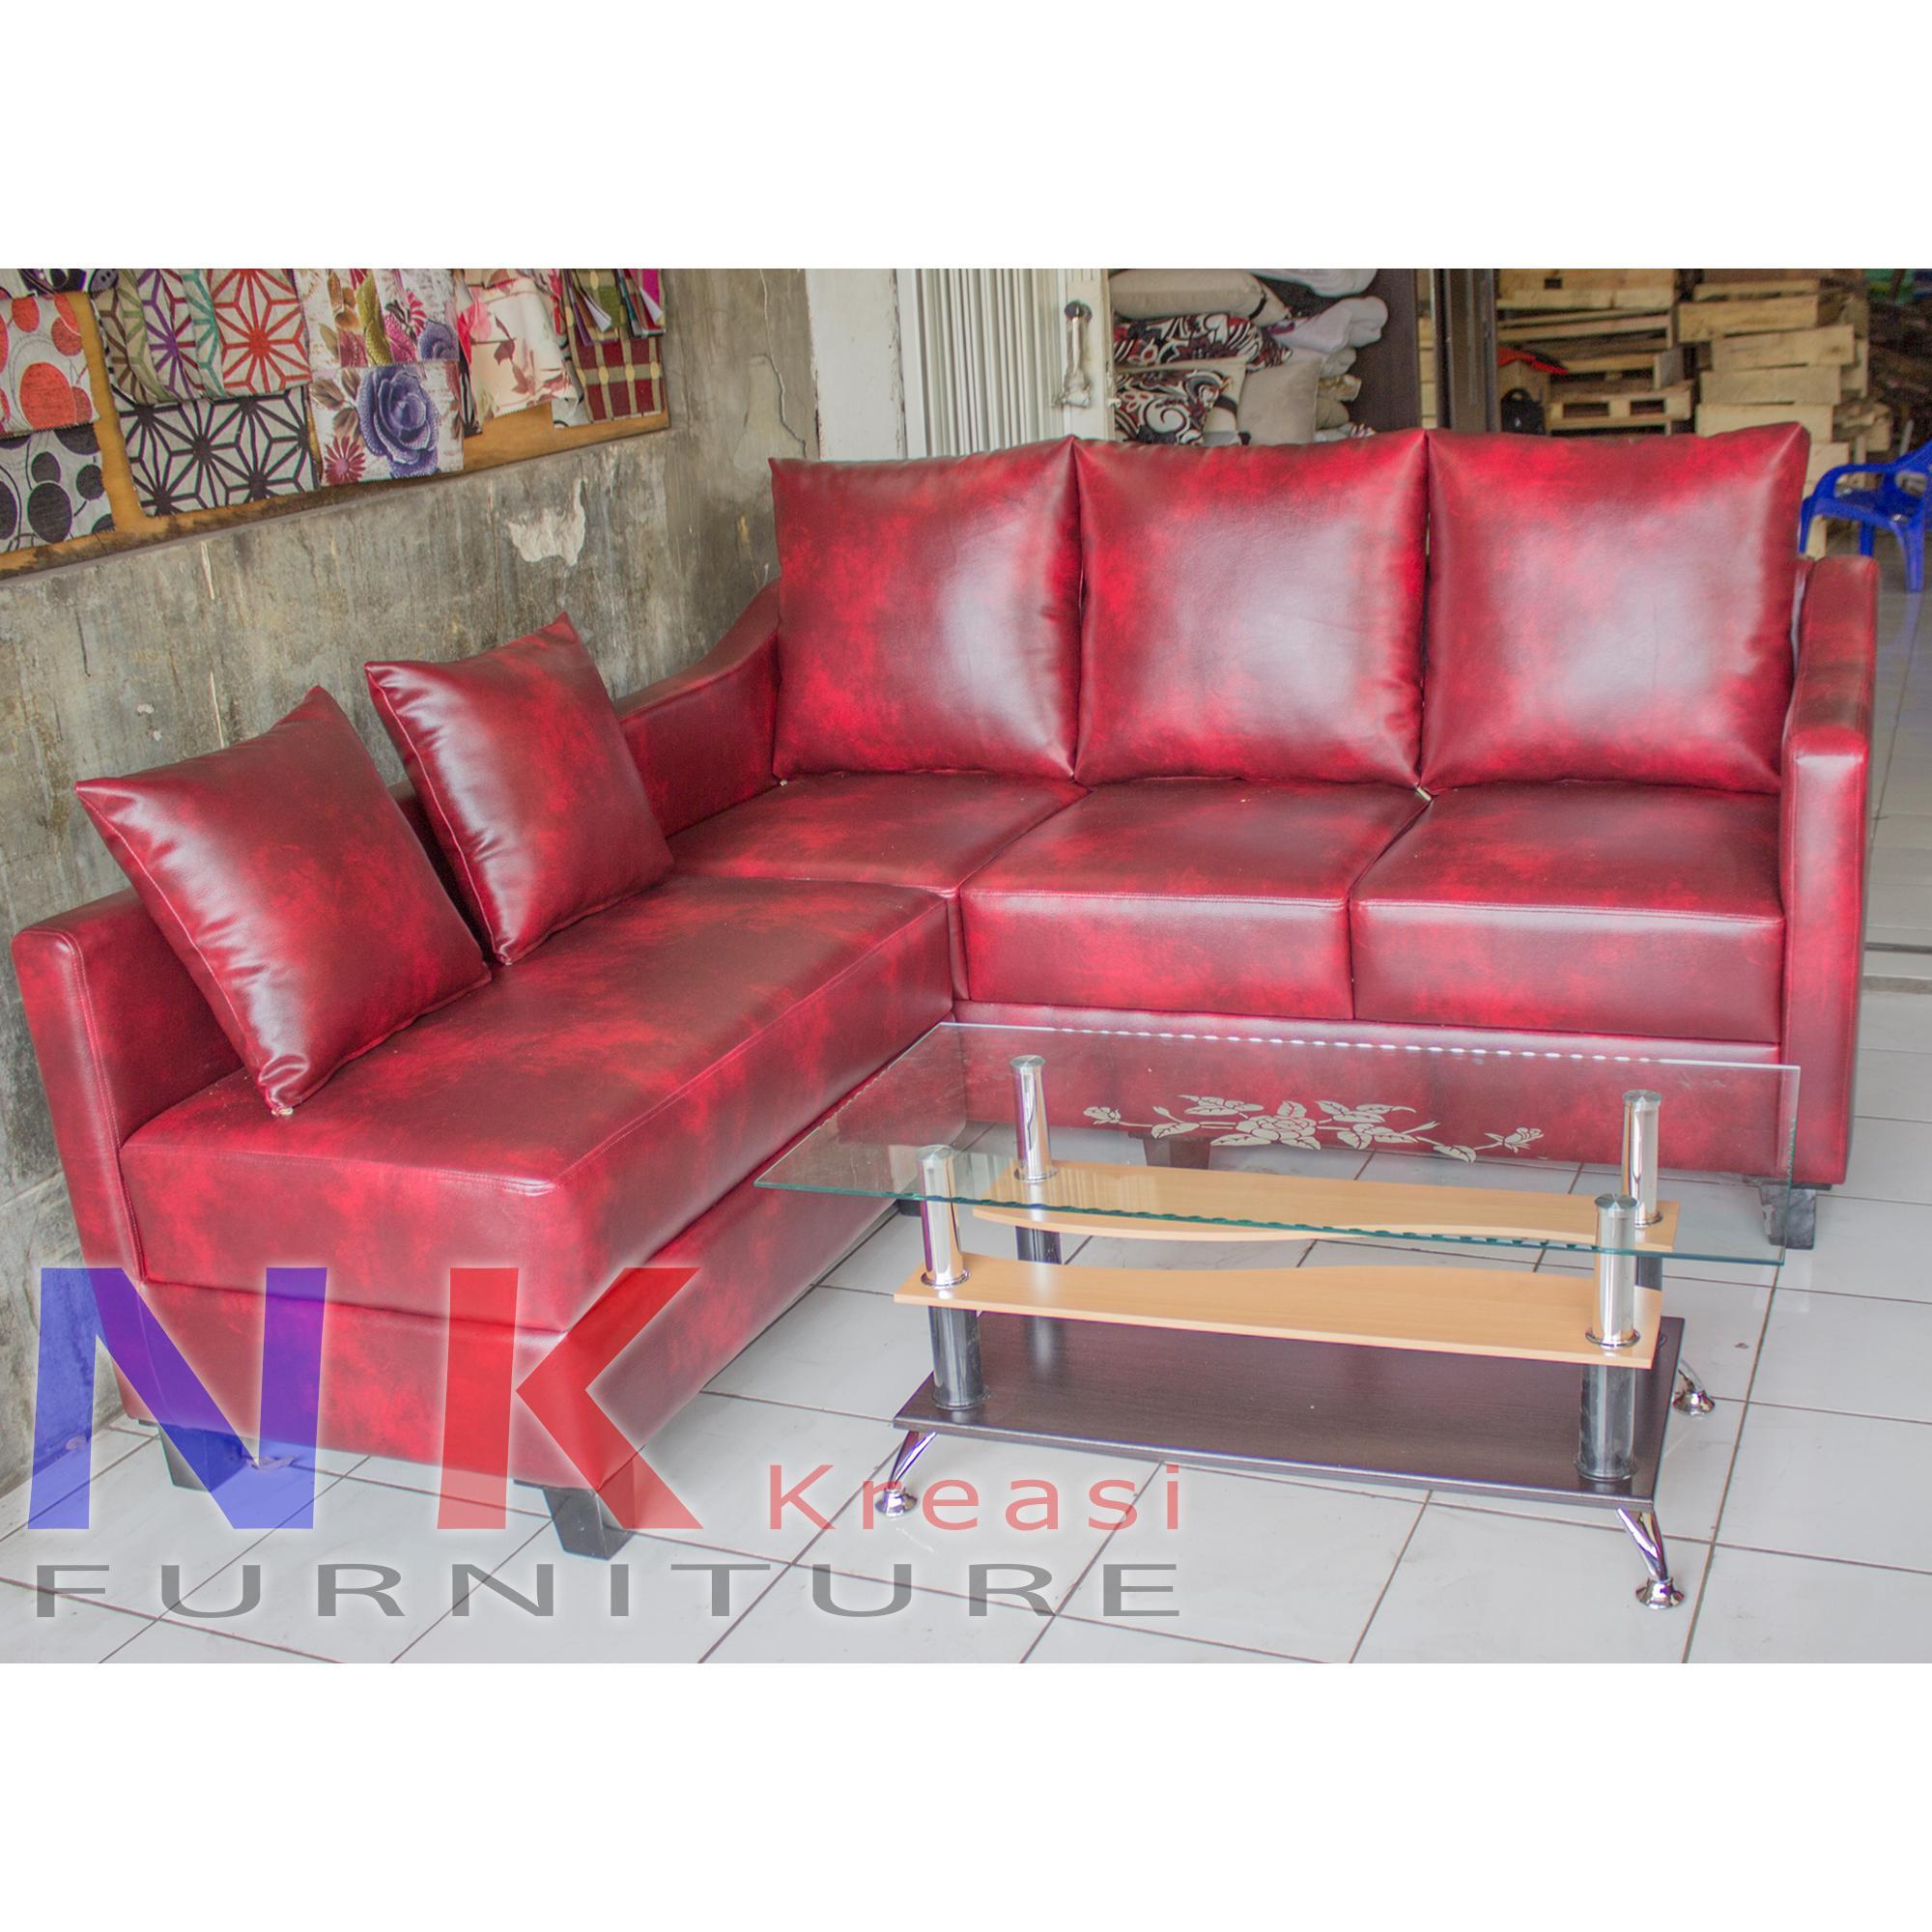 Sofa Kursi Tamu L Minimalis, Sofa Sudut kantor Mewah + MEJA TAMU - JABODETABEK ONLY